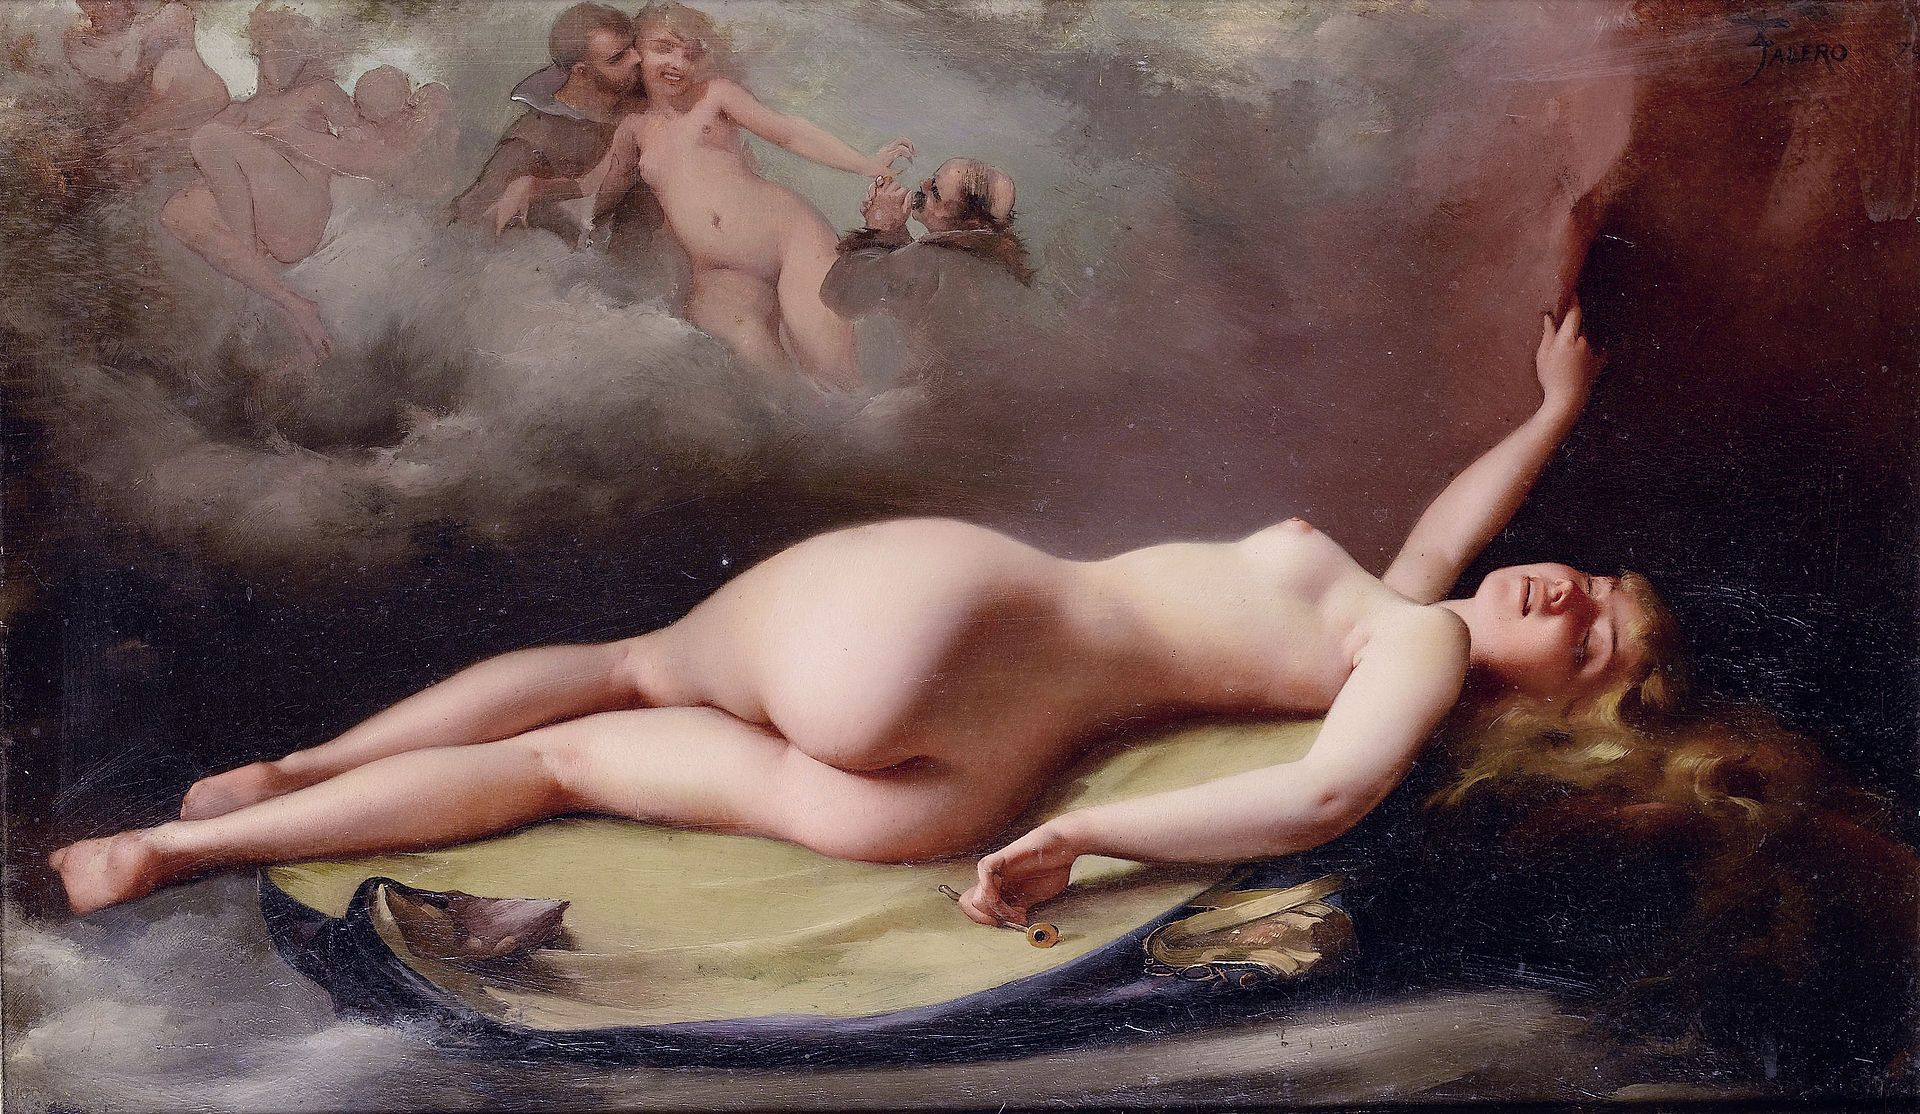 Retro Rule Five Paul Sieffert Giacomo Grosso u0026 Luis Ricardo Falero and the Art of the Reclining Nude & Category:Luis Ricardo Falero - Wikimedia Commons | Falero ... islam-shia.org